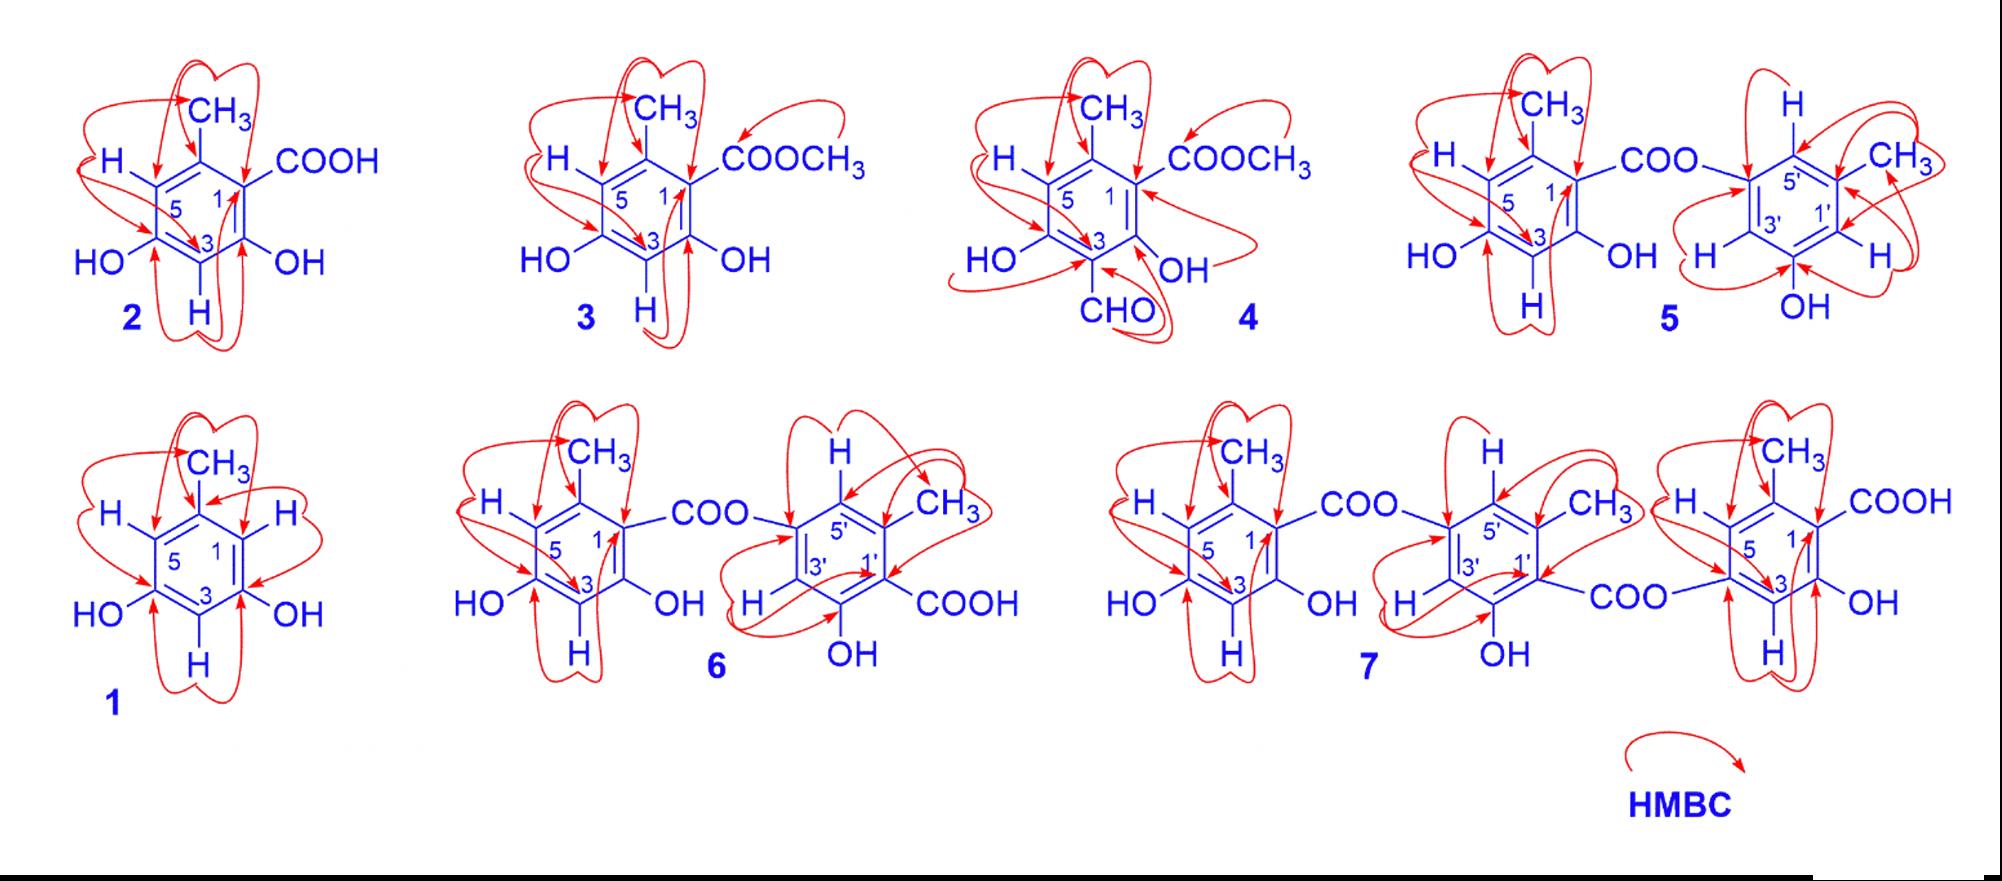 Figure 1  Key HMBC of isolated compounds